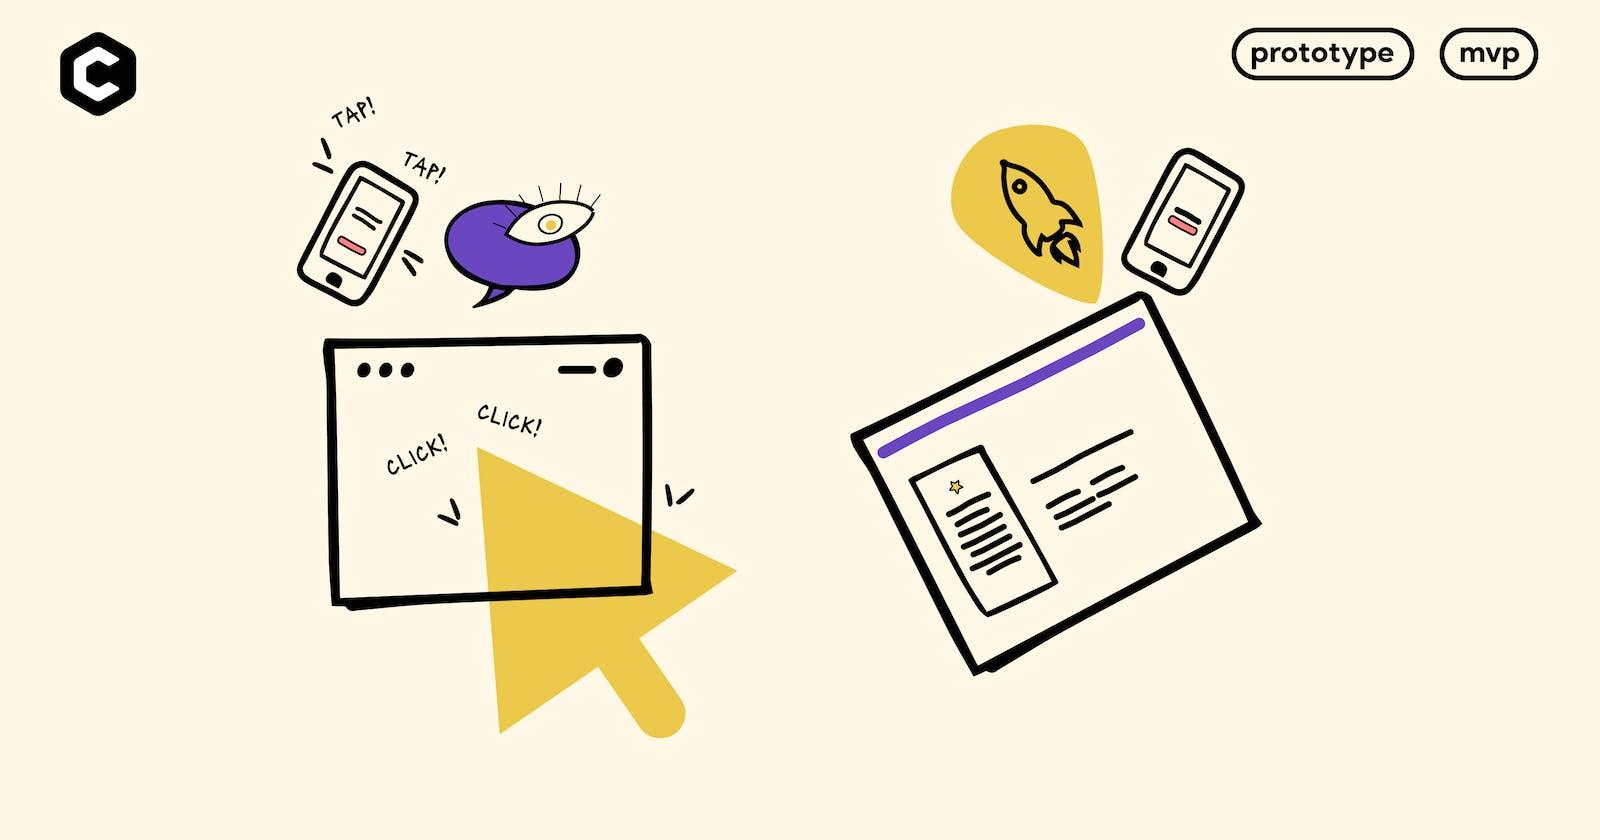 Prototype vs Minimum viable product